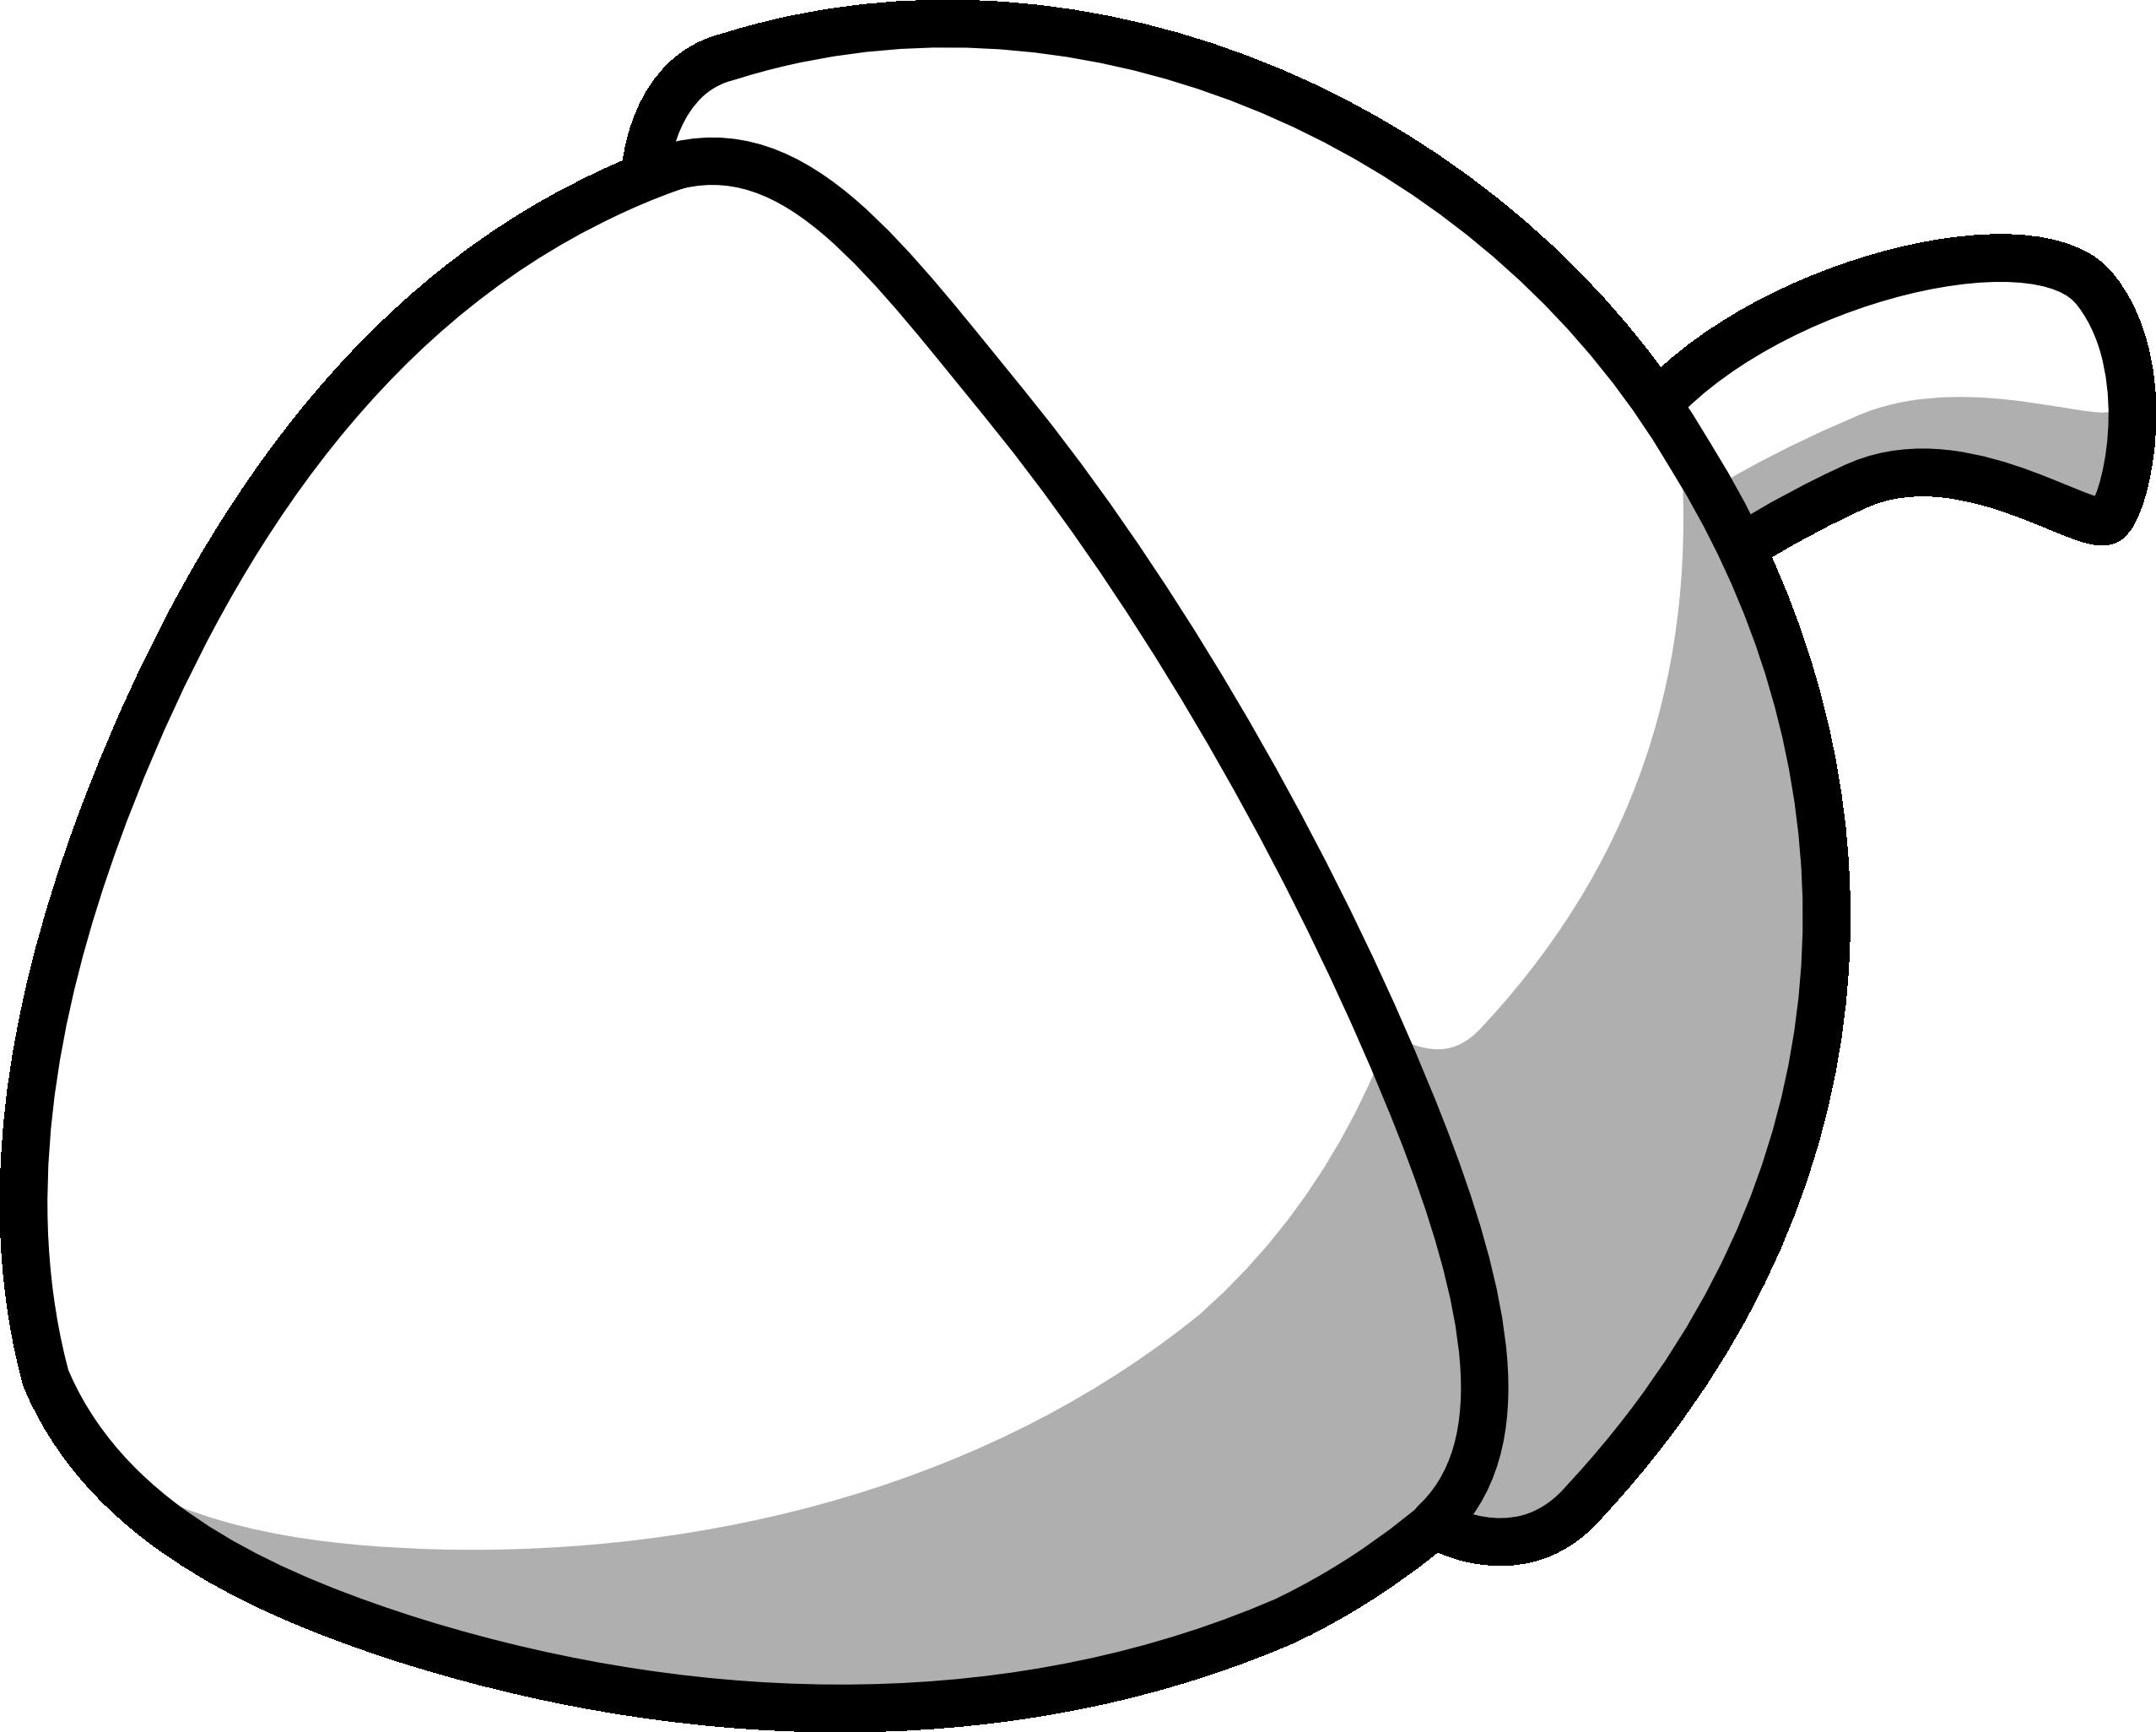 acorn clipart black and white-acorn clipart black and white-8